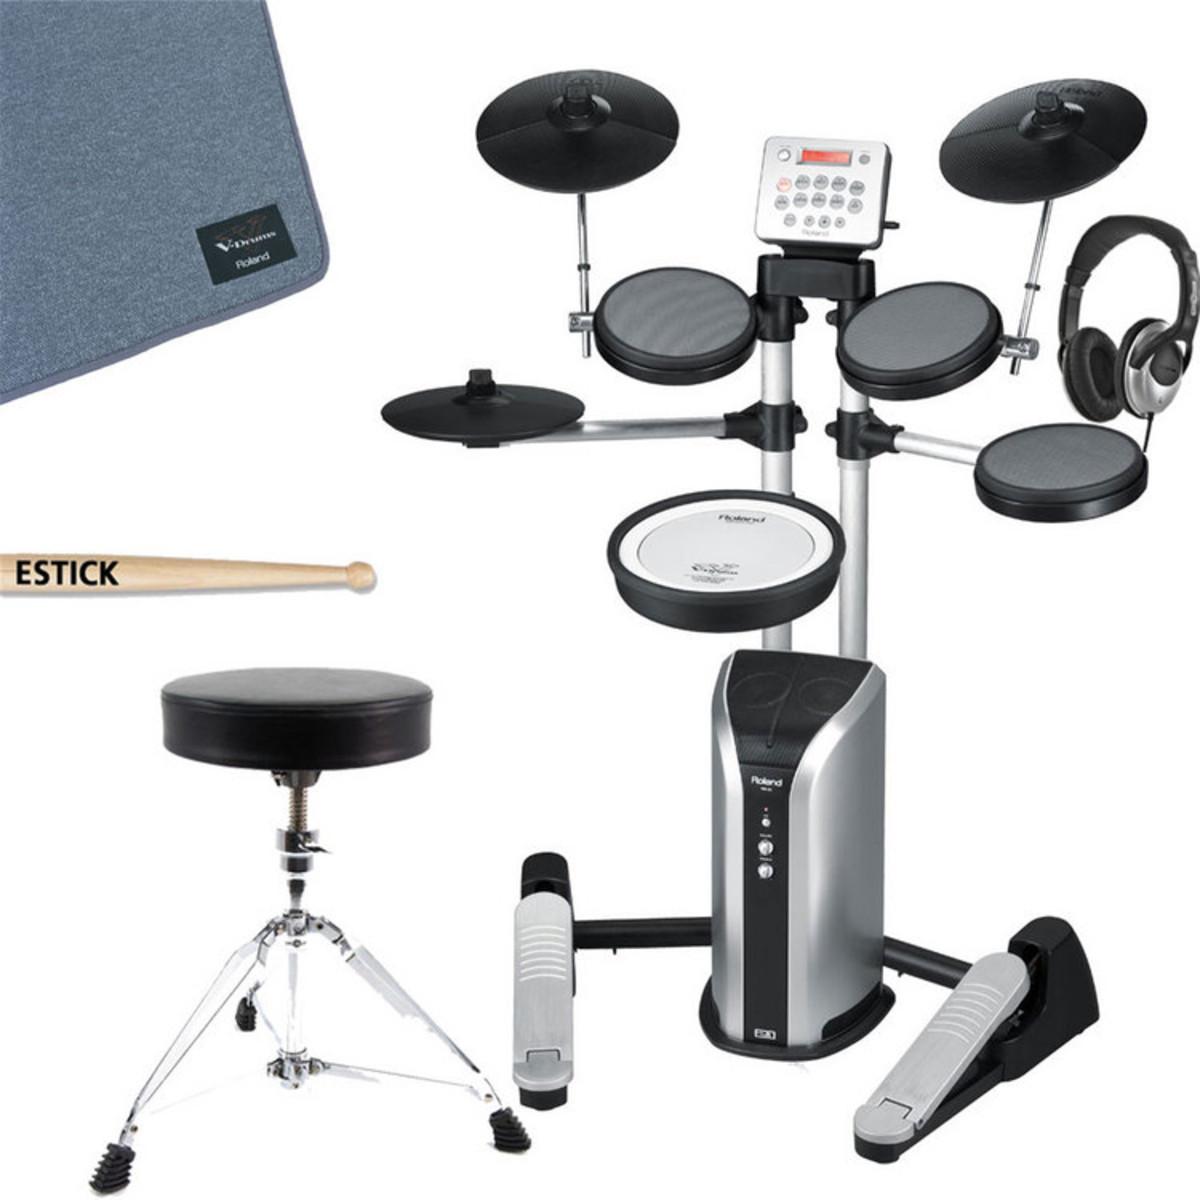 Roland hd 3 v drums lite batteria elettronica completo pacchetto a - Roland hd3 v drum lite set ...